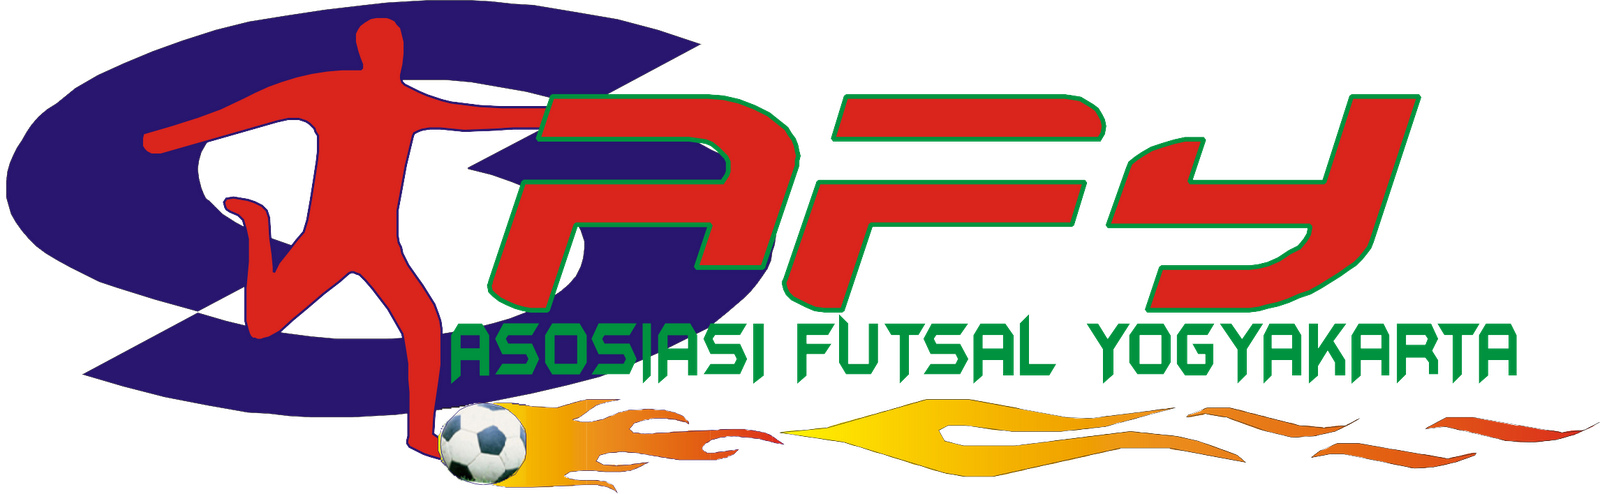 Asosiasi Futsal Yogyakarta